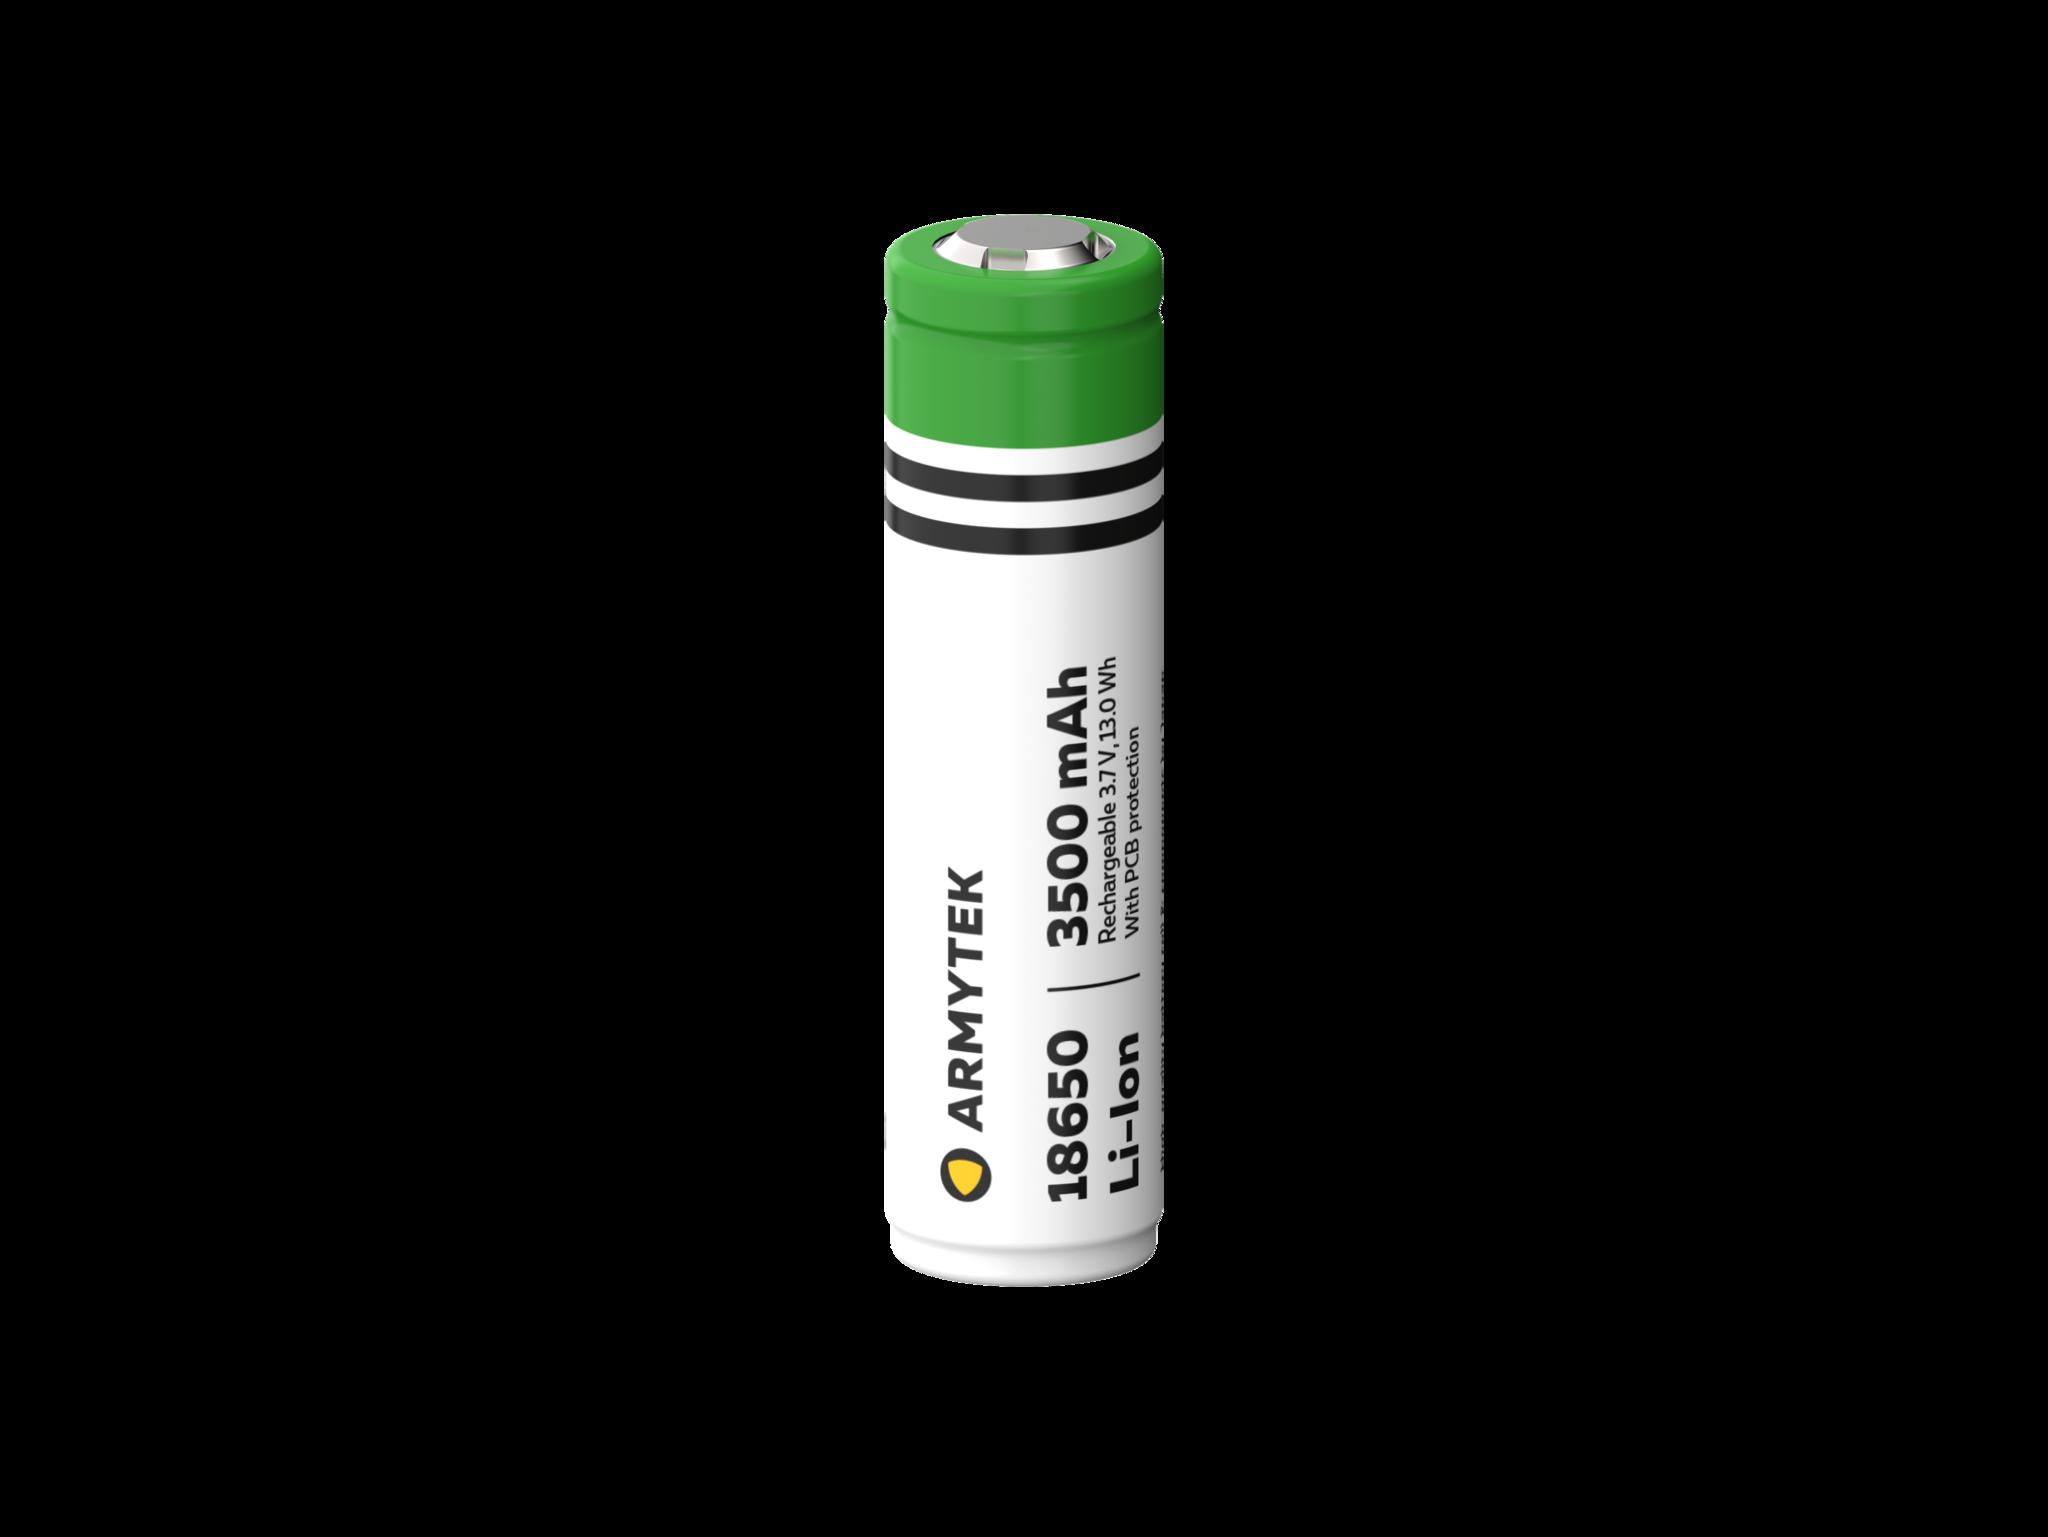 Li-Ion аккумулятор Armytek 18650 3500 mAh - фото 1